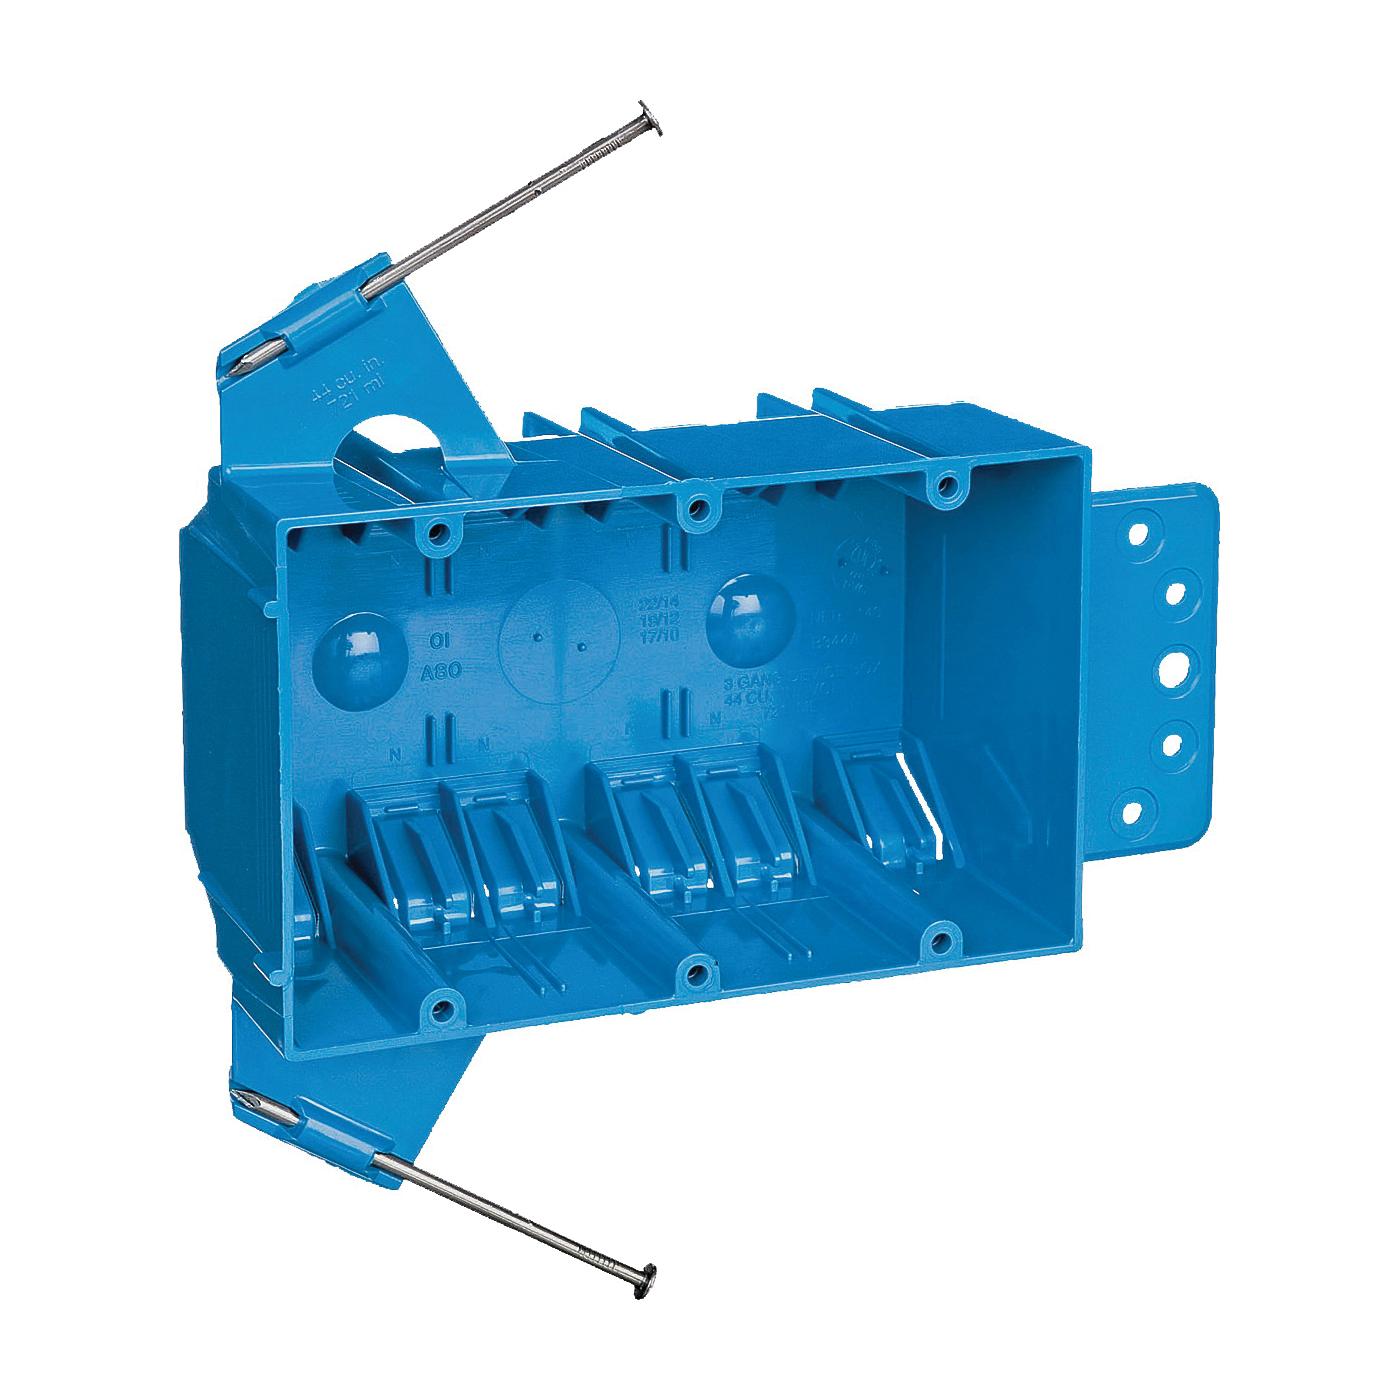 Picture of Carlon B344AB-UPC Outlet Box, 3-Gang, PVC, Blue, Captive Nail, Bracket Mounting